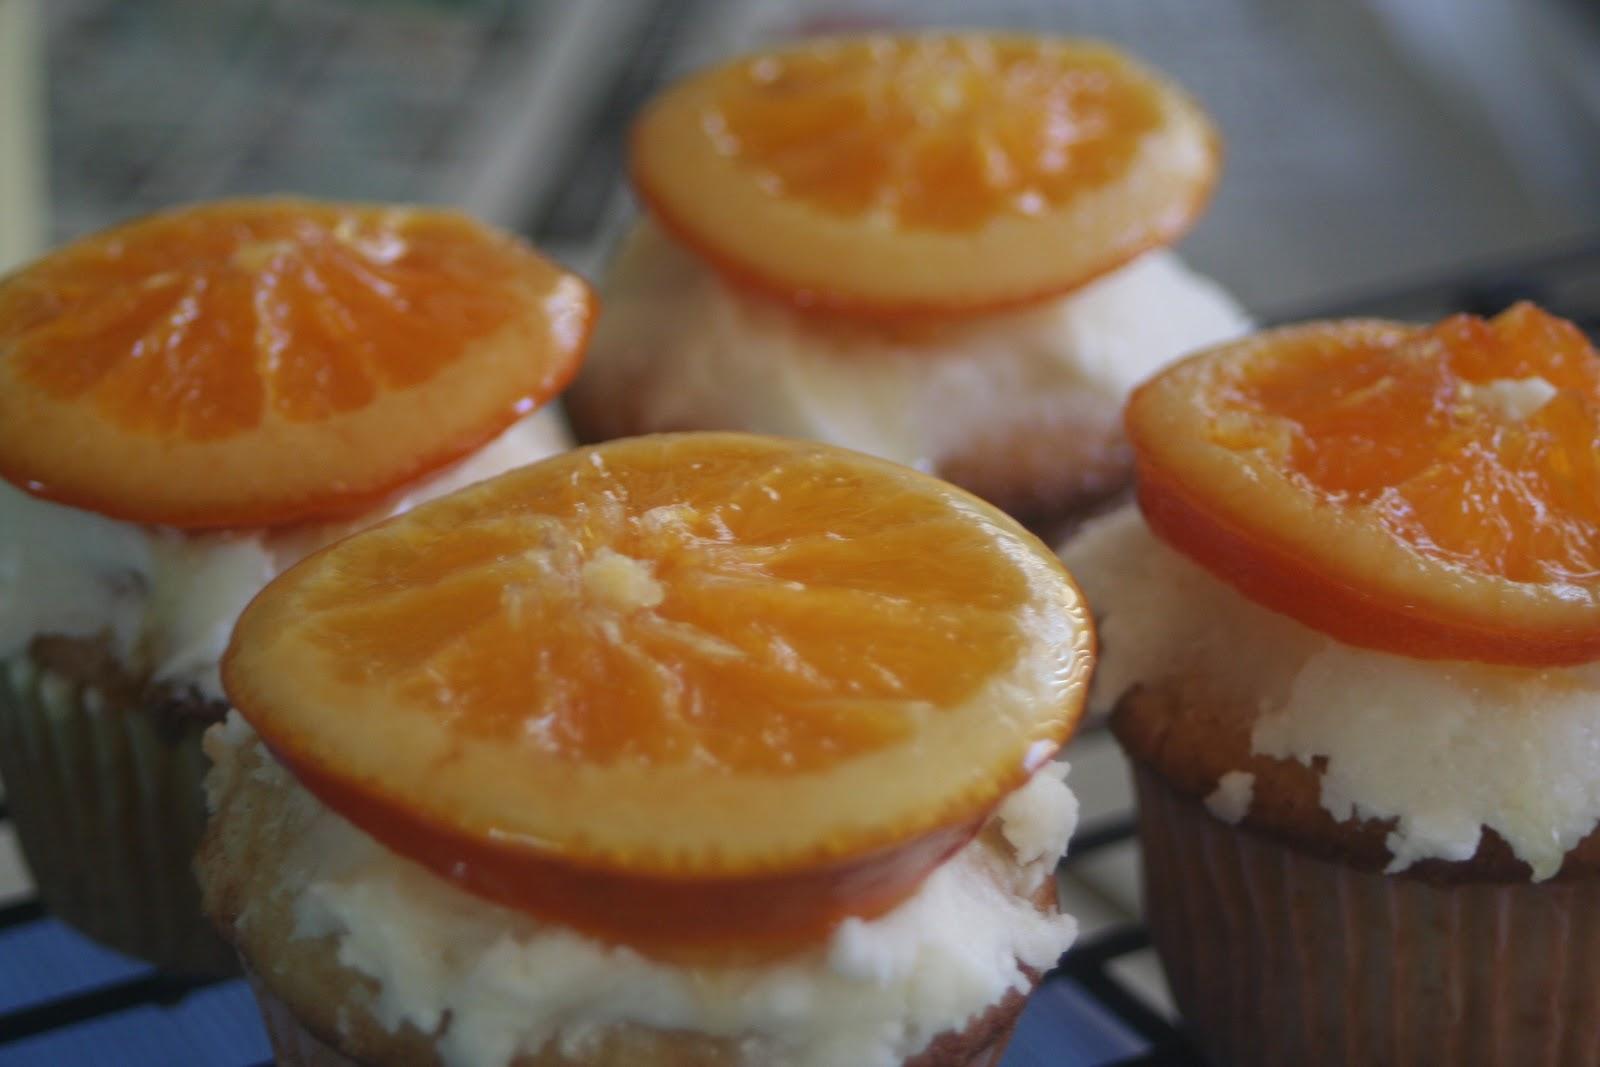 ... Baking Sisters: MSC: Orange Vanilla Bean Cupcakes with Candied Oranges